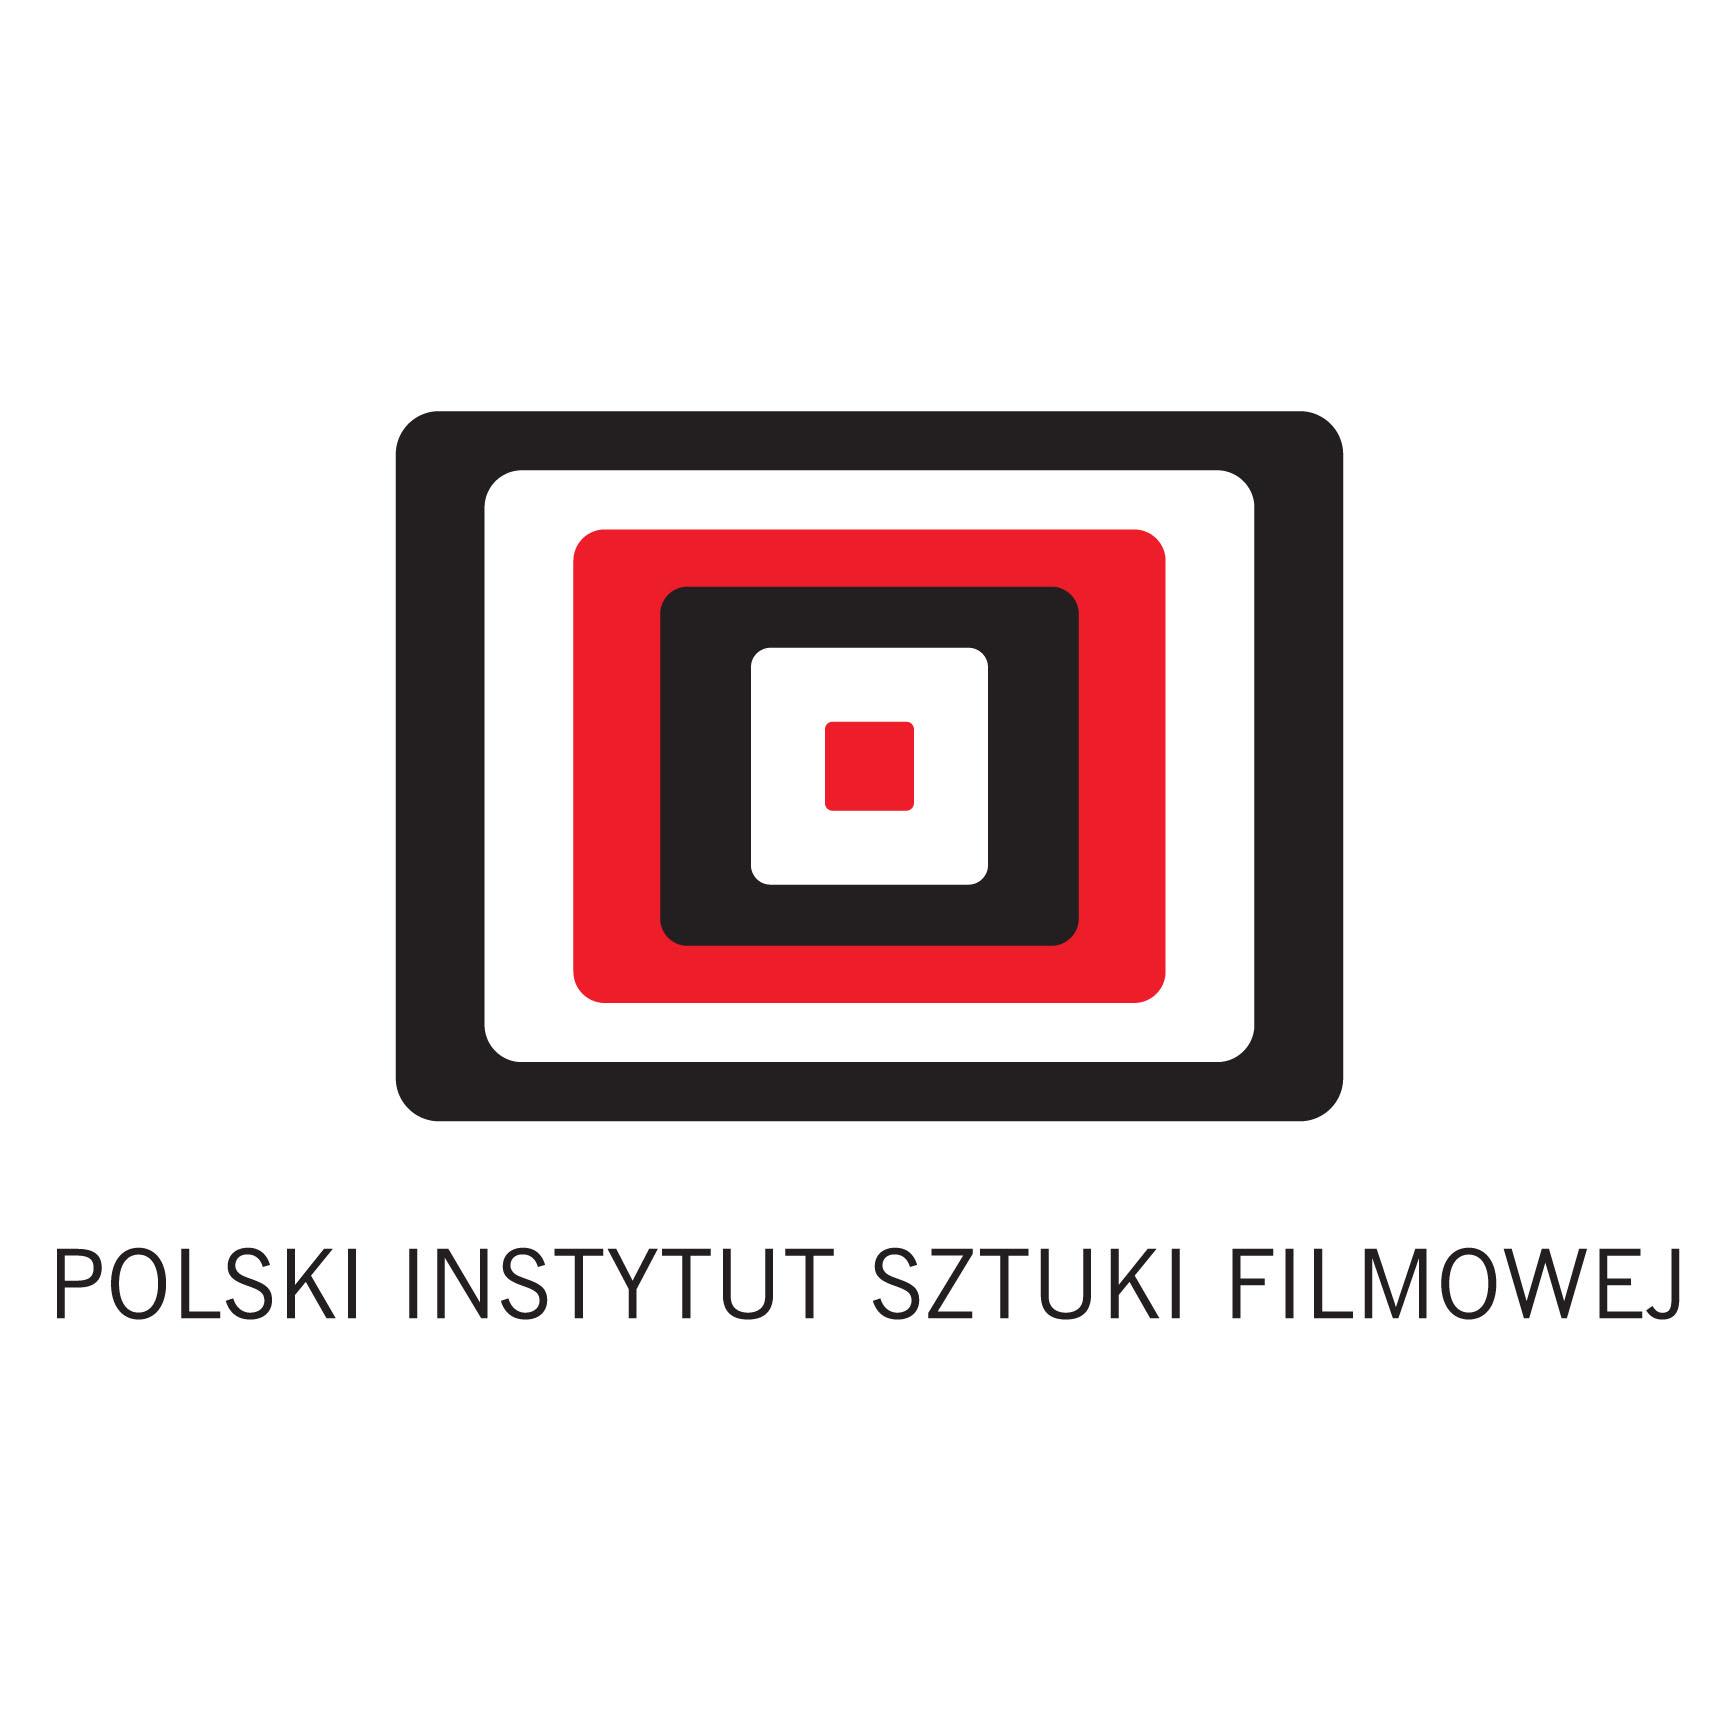 https://i0.wp.com/www.stentor.pl/files/produkty/pliki/pisfpol3.jpg